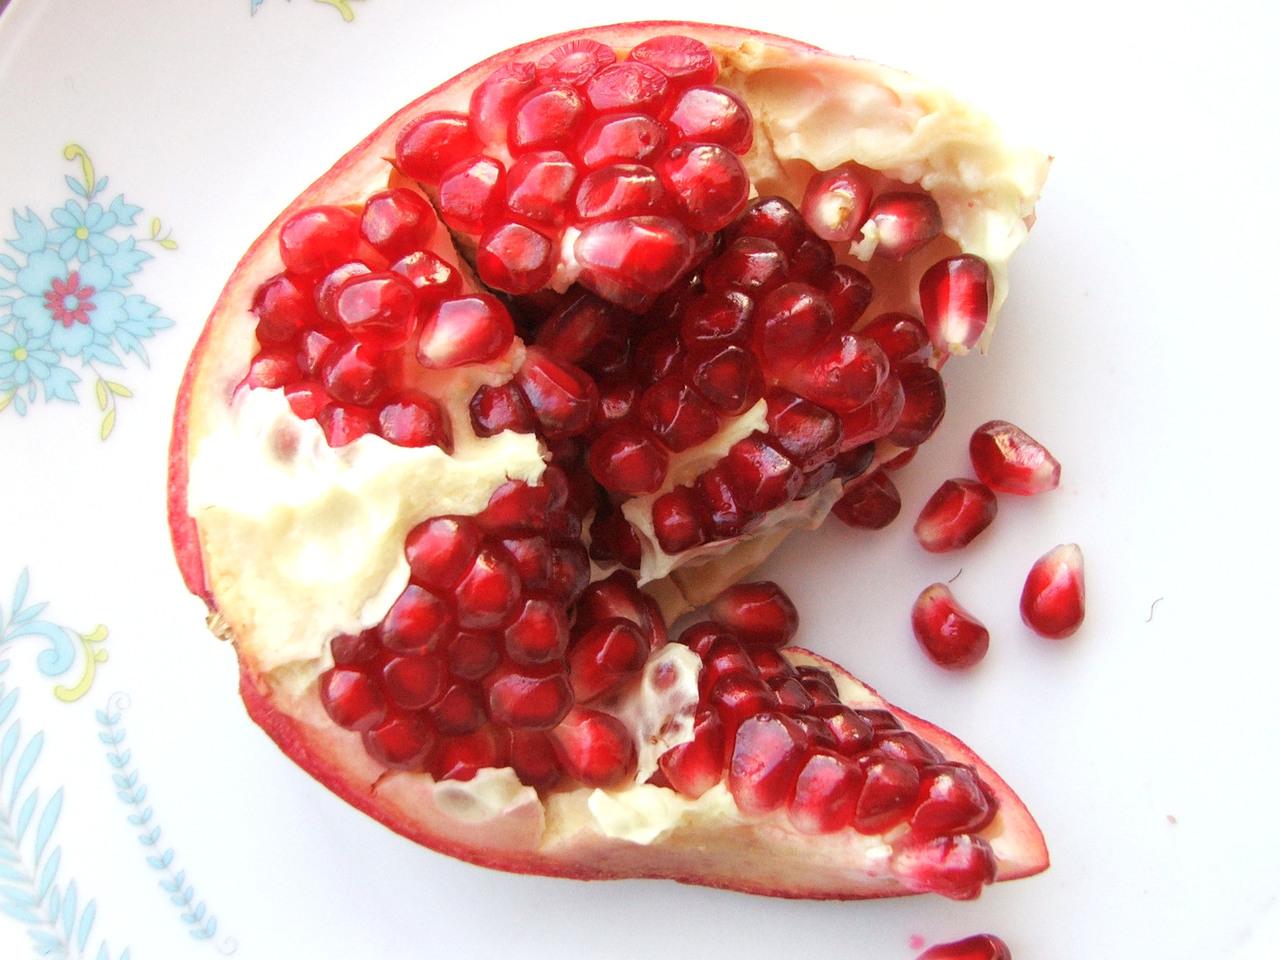 pomegranate-1516600-1280x960